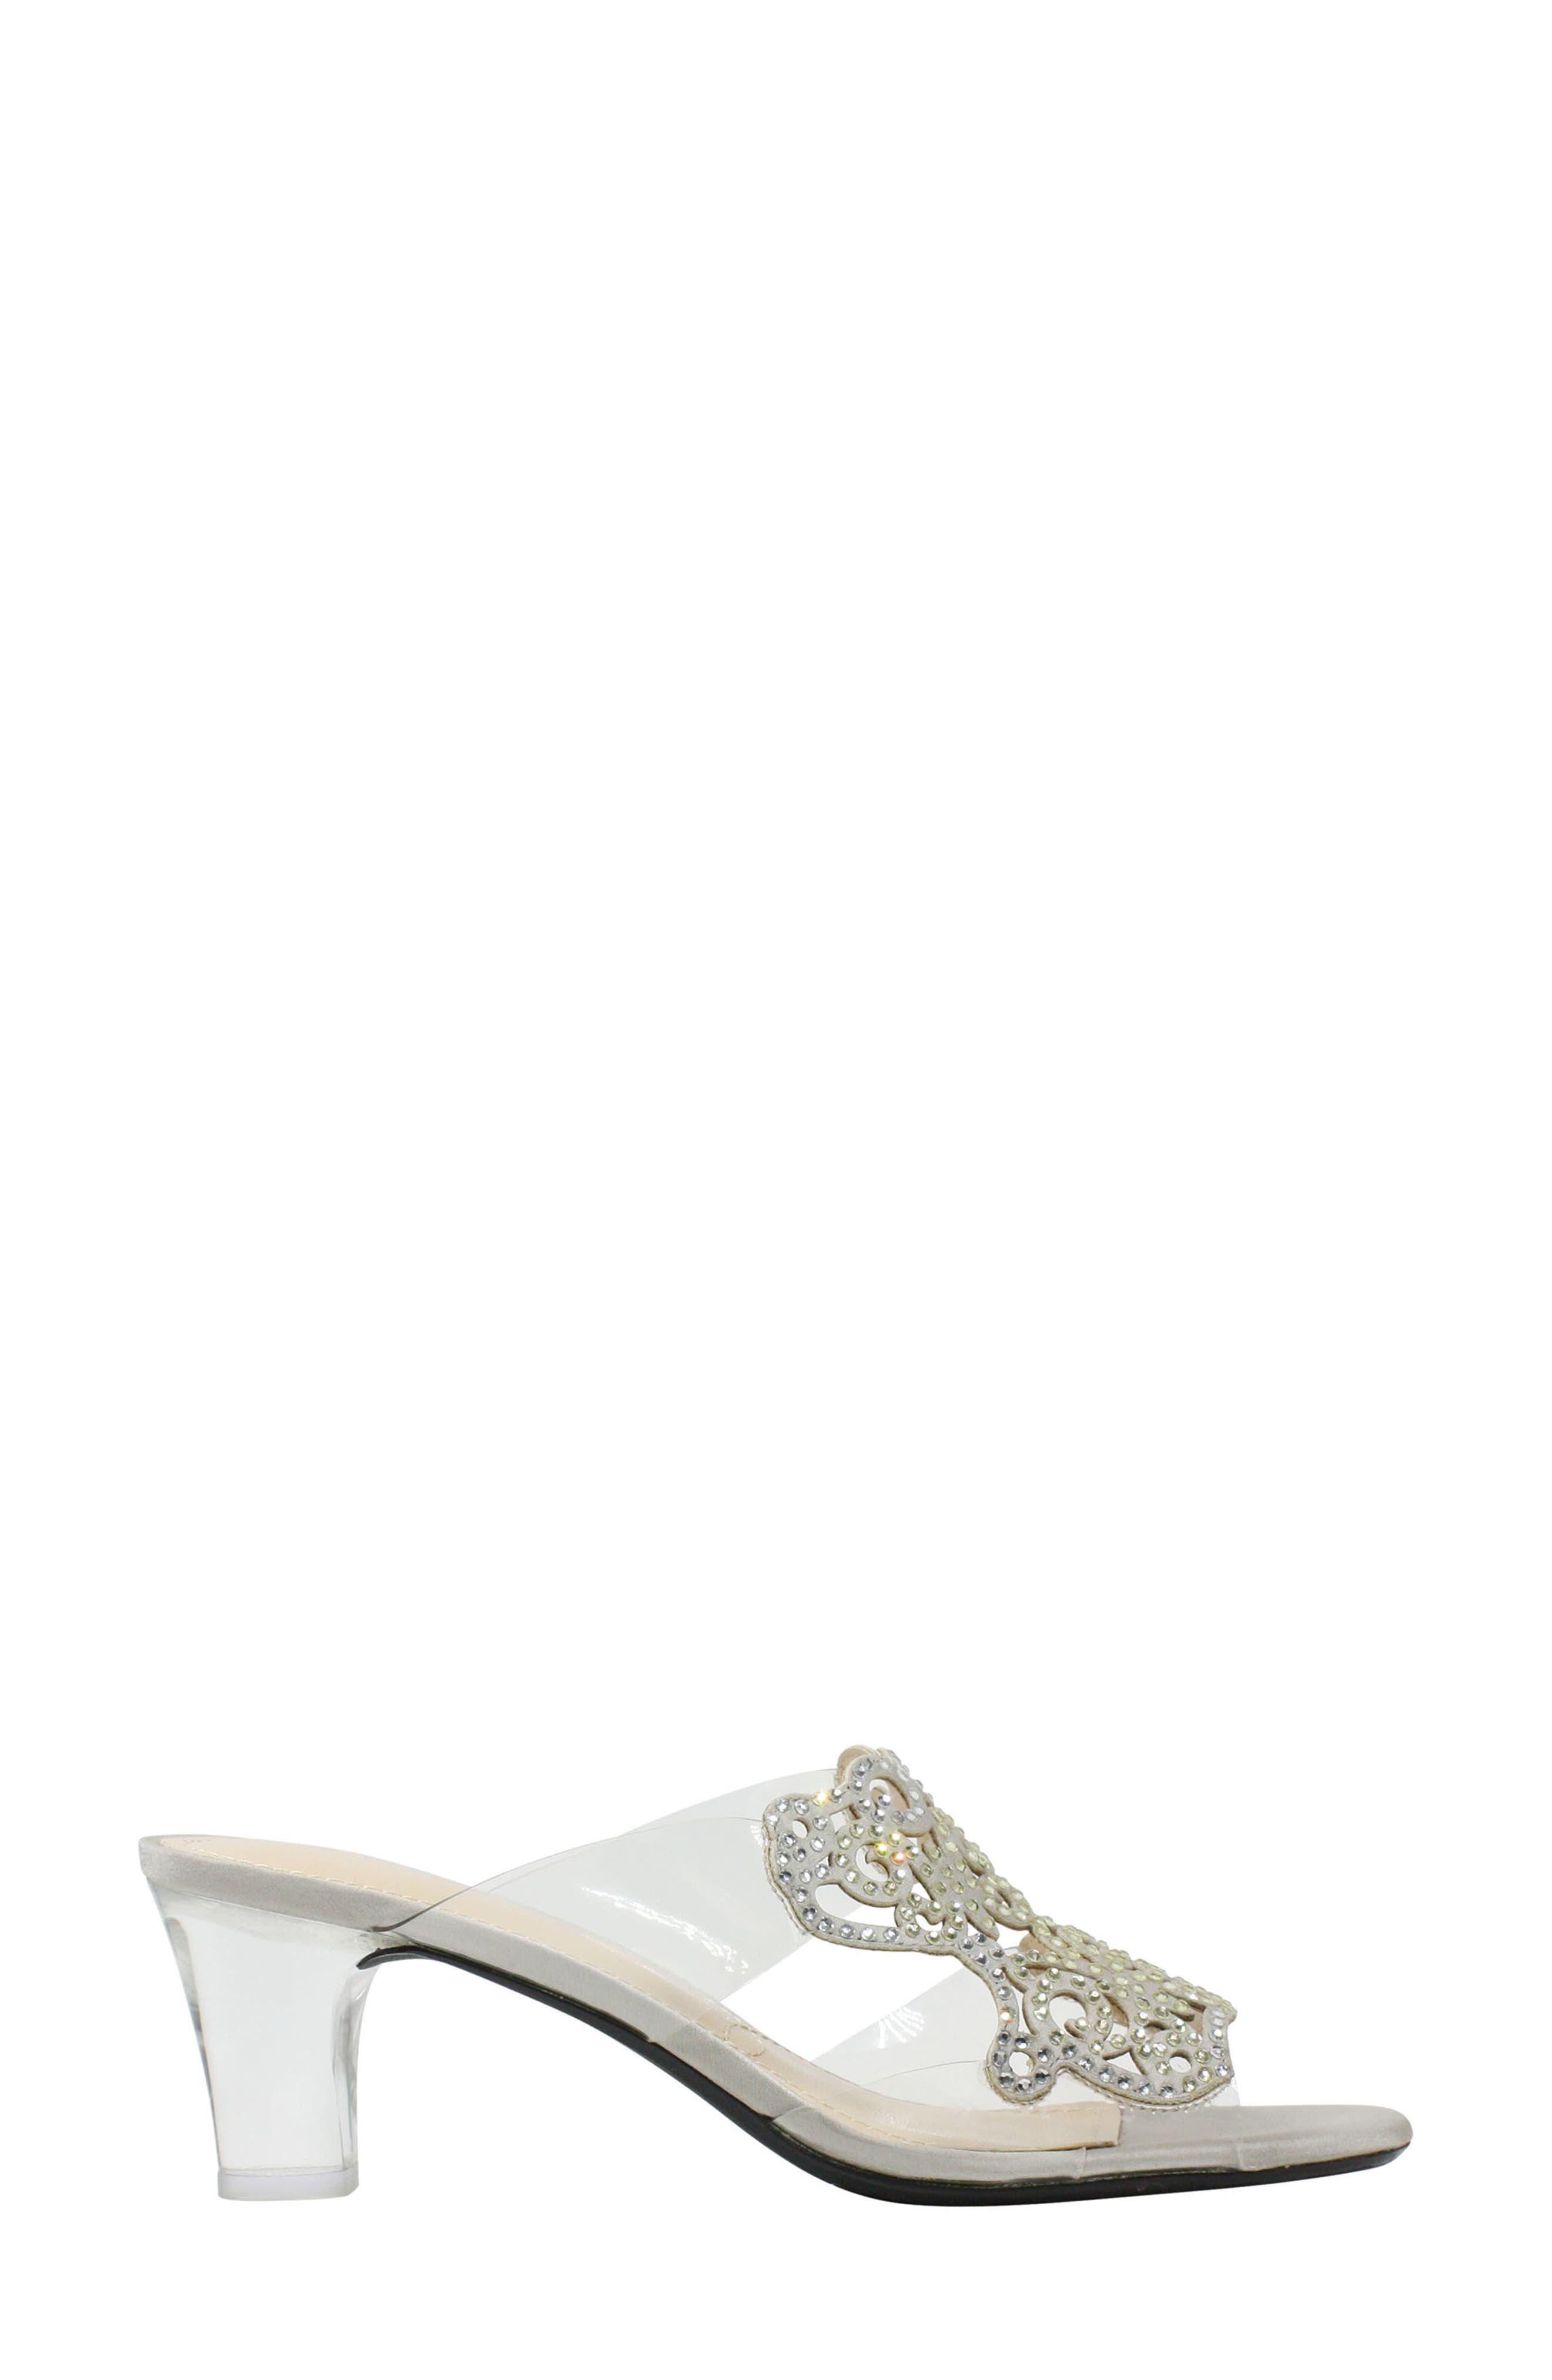 Sabreen Crystal Embellished Sandal,                             Alternate thumbnail 3, color,                             SILVER/ CLEAR